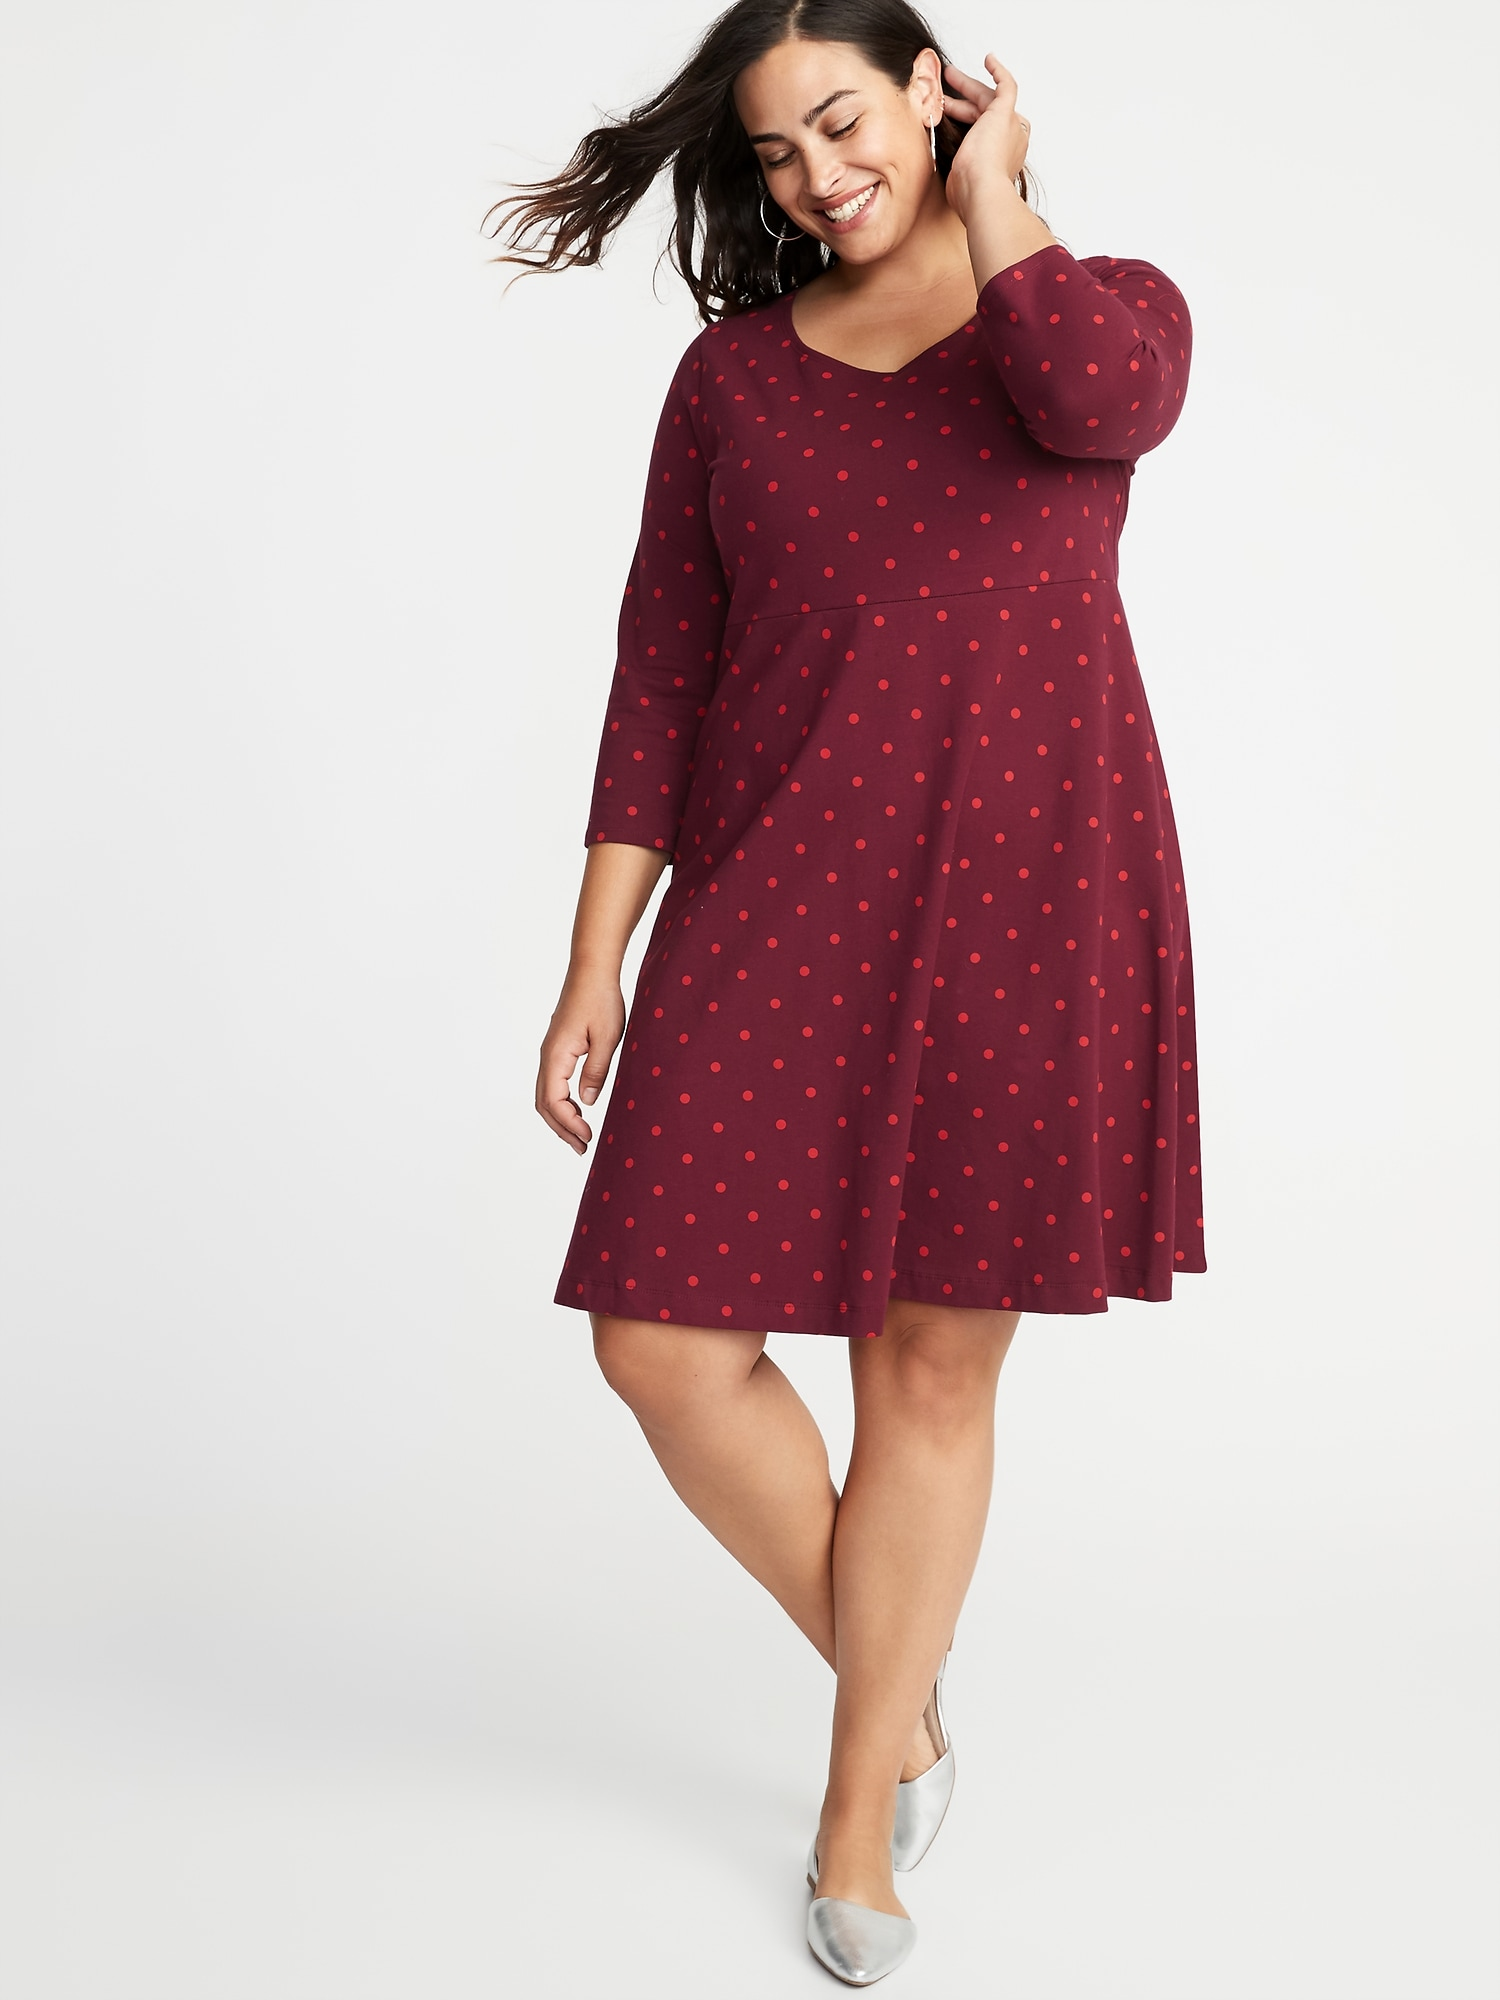 30a90843efe Fit   Flare Plus-Size Scoop-Neck Dress